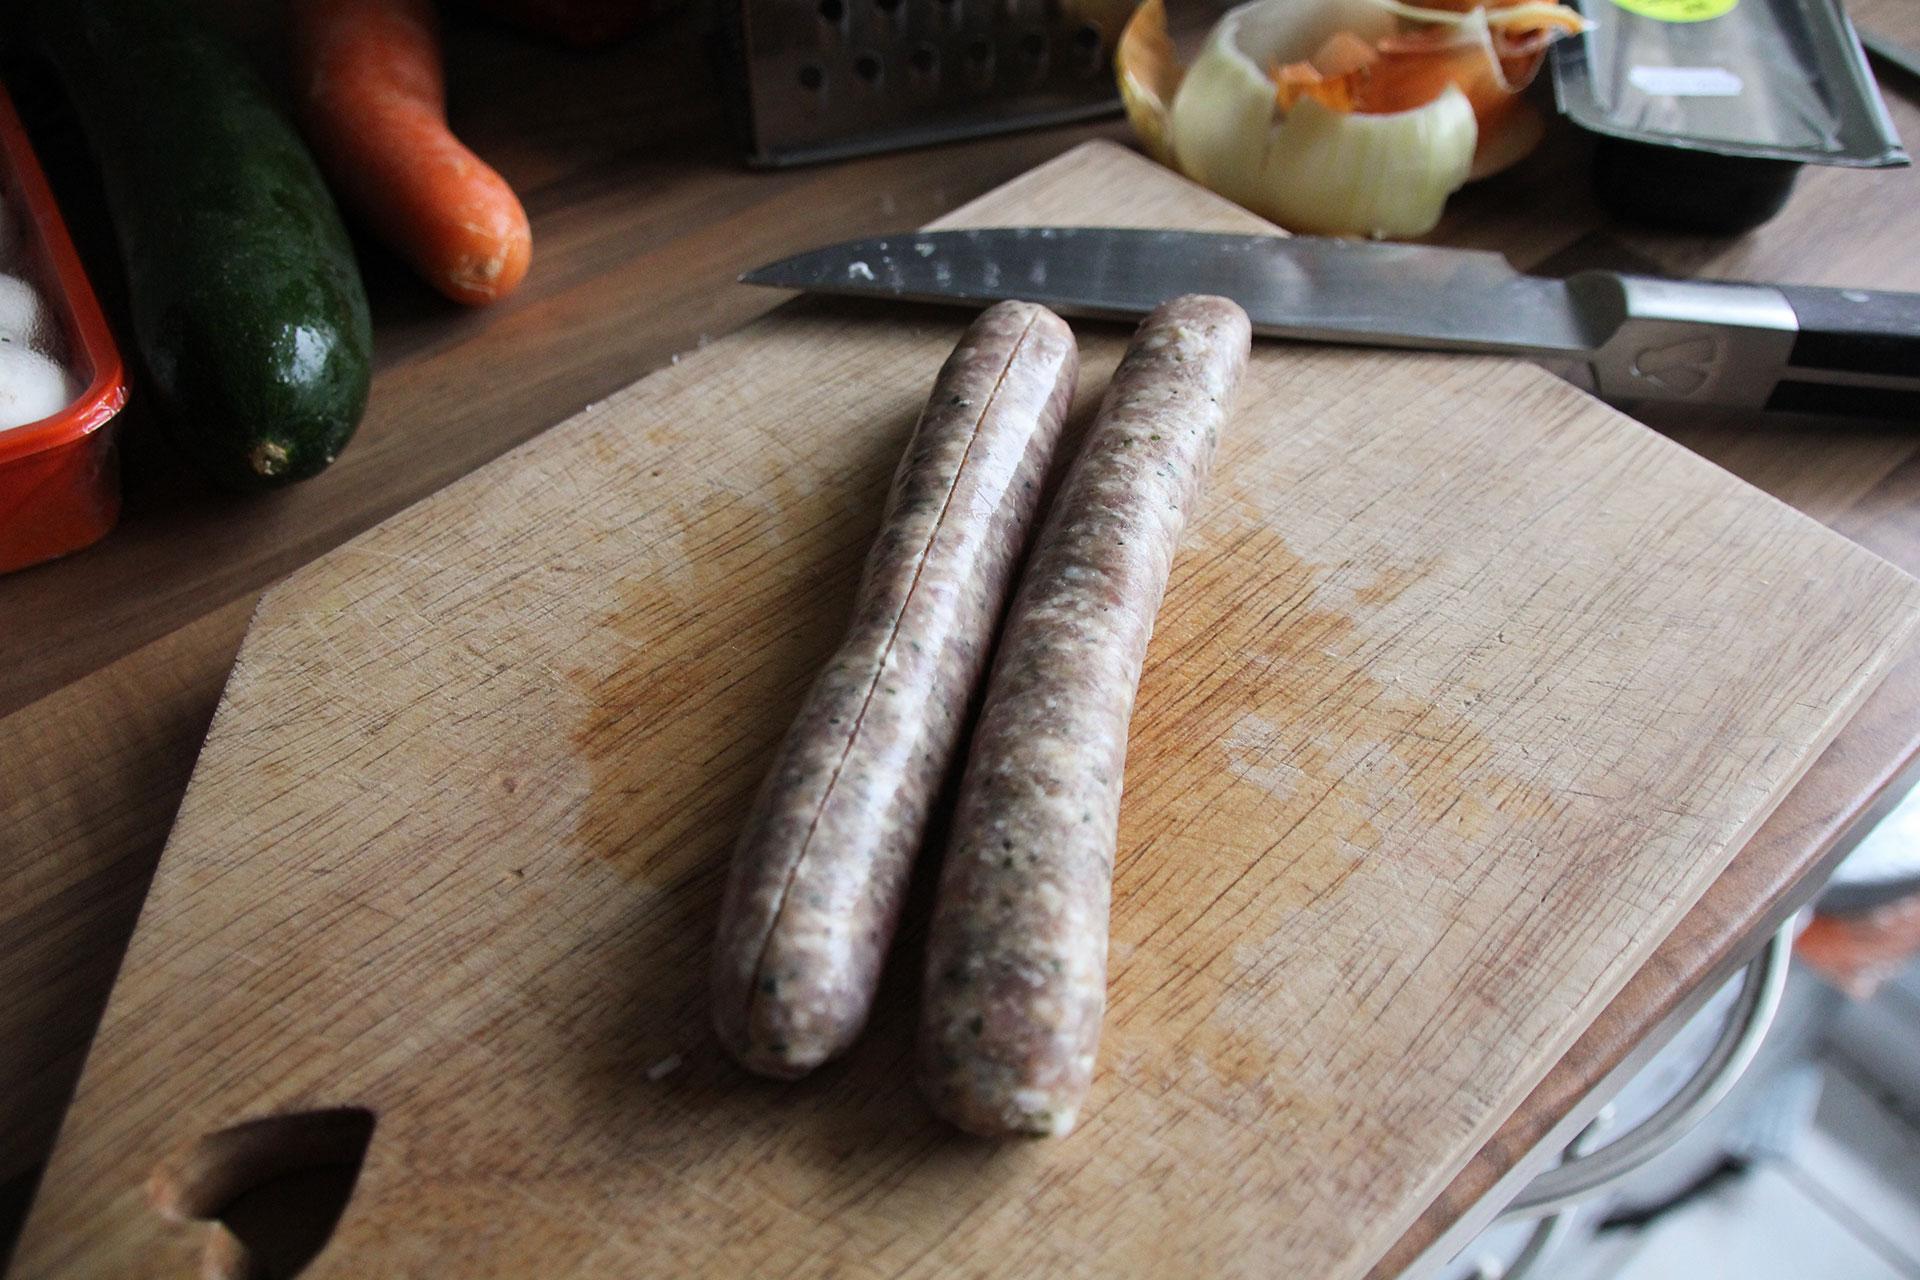 Slice lengthwise along sausage